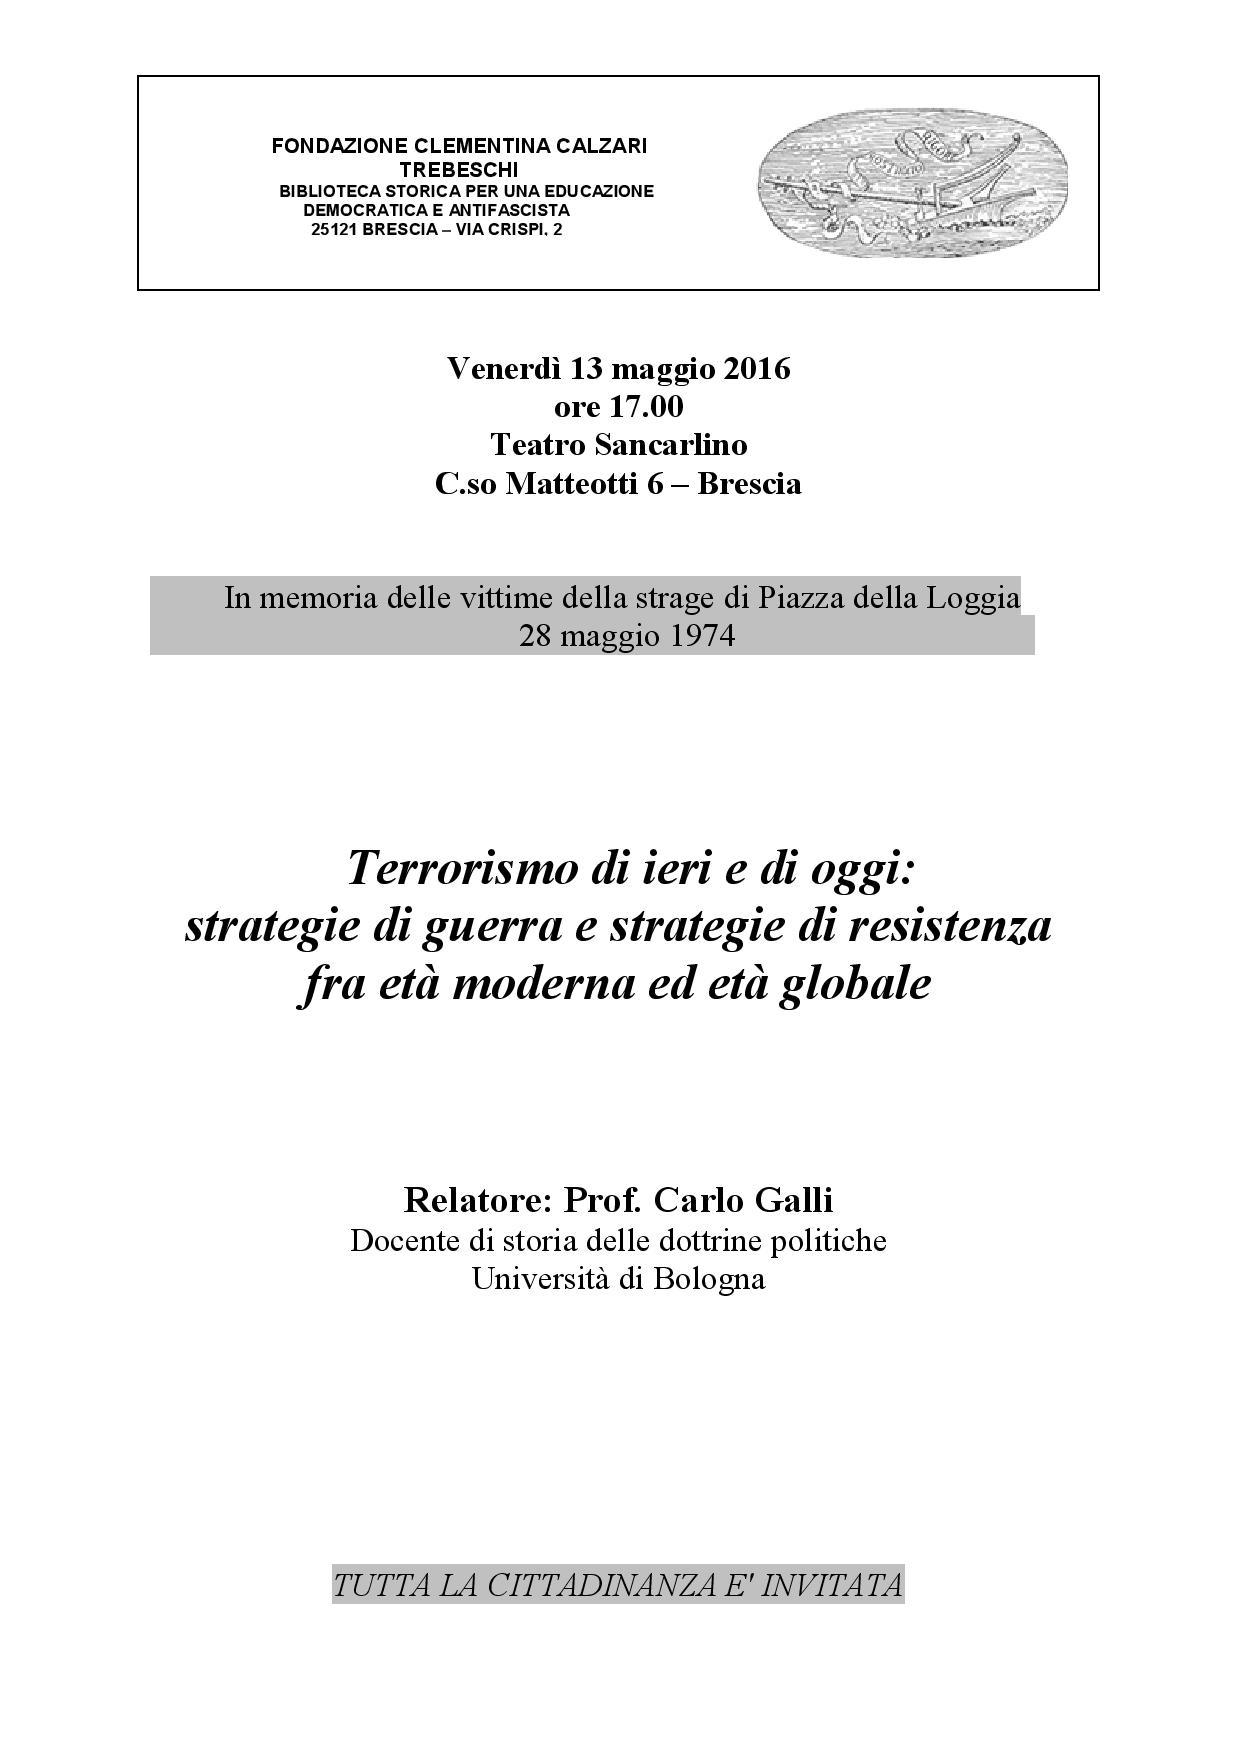 GALLI 2016-page-001